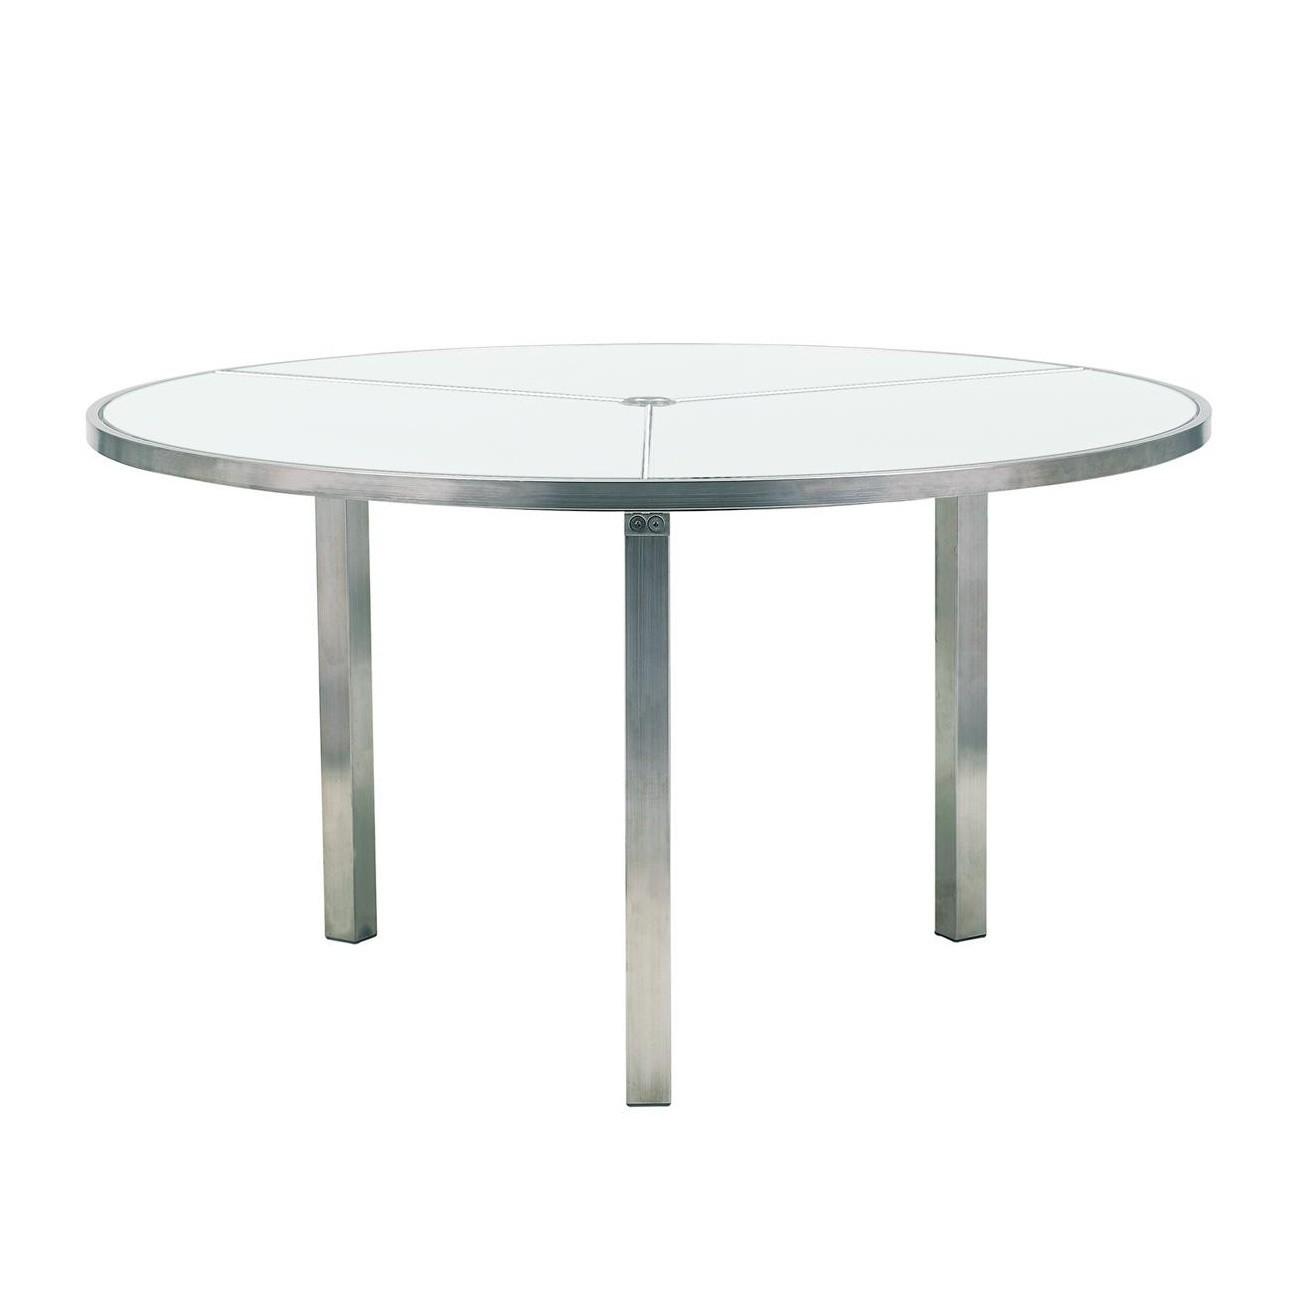 Royal Botania O-Zon - Table de Jardin ronde Ø130 | AmbienteDirect